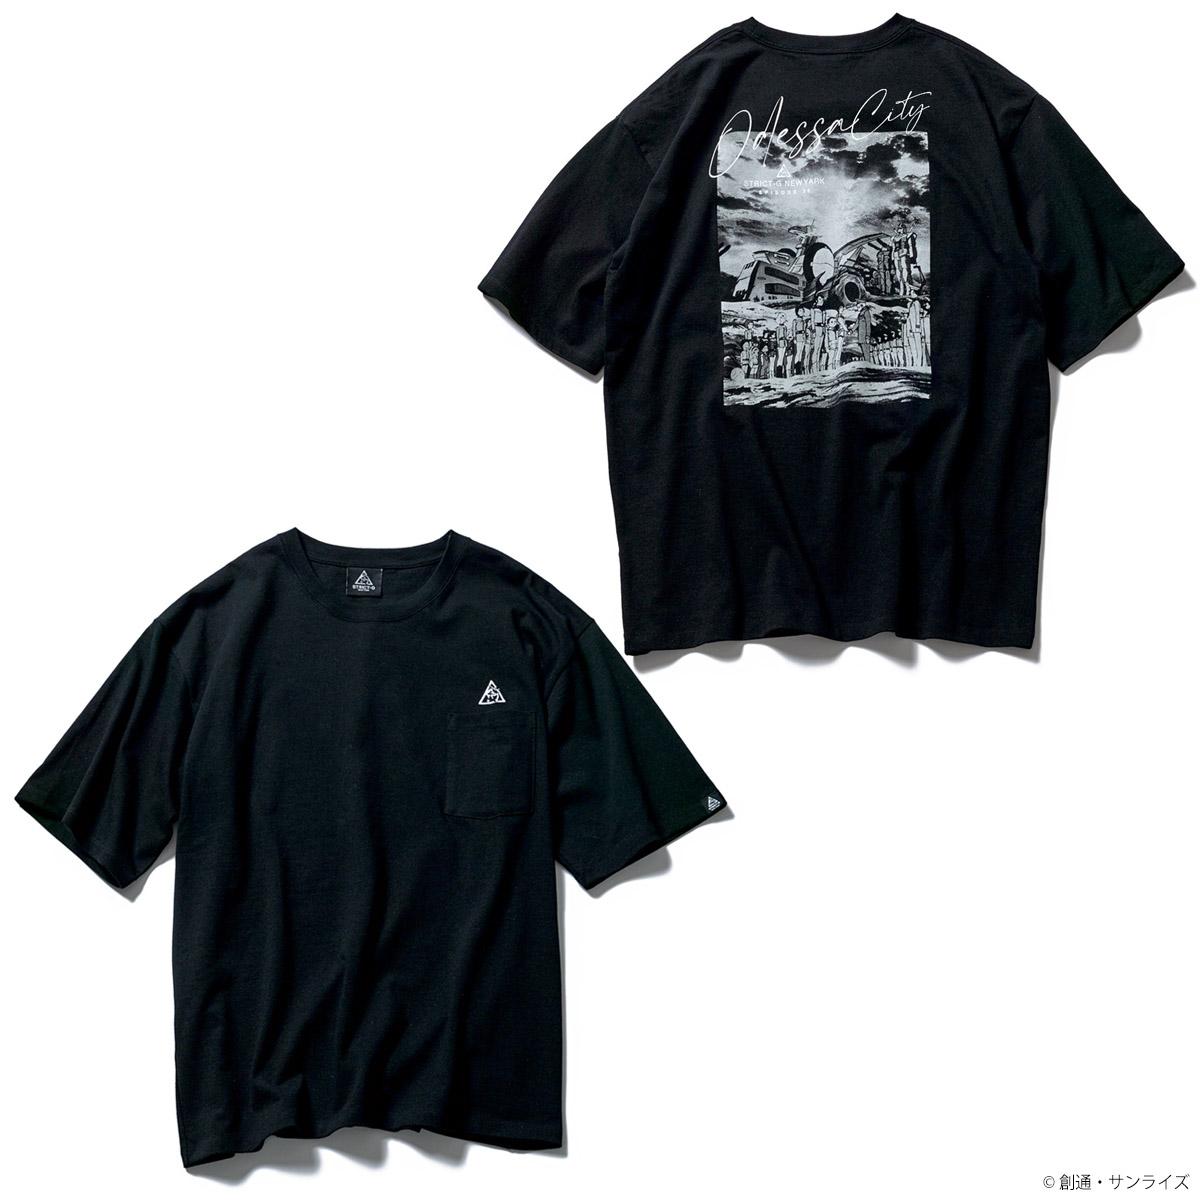 STRICT-G NEW YARK ポケットビッグTシャツ ODESSA